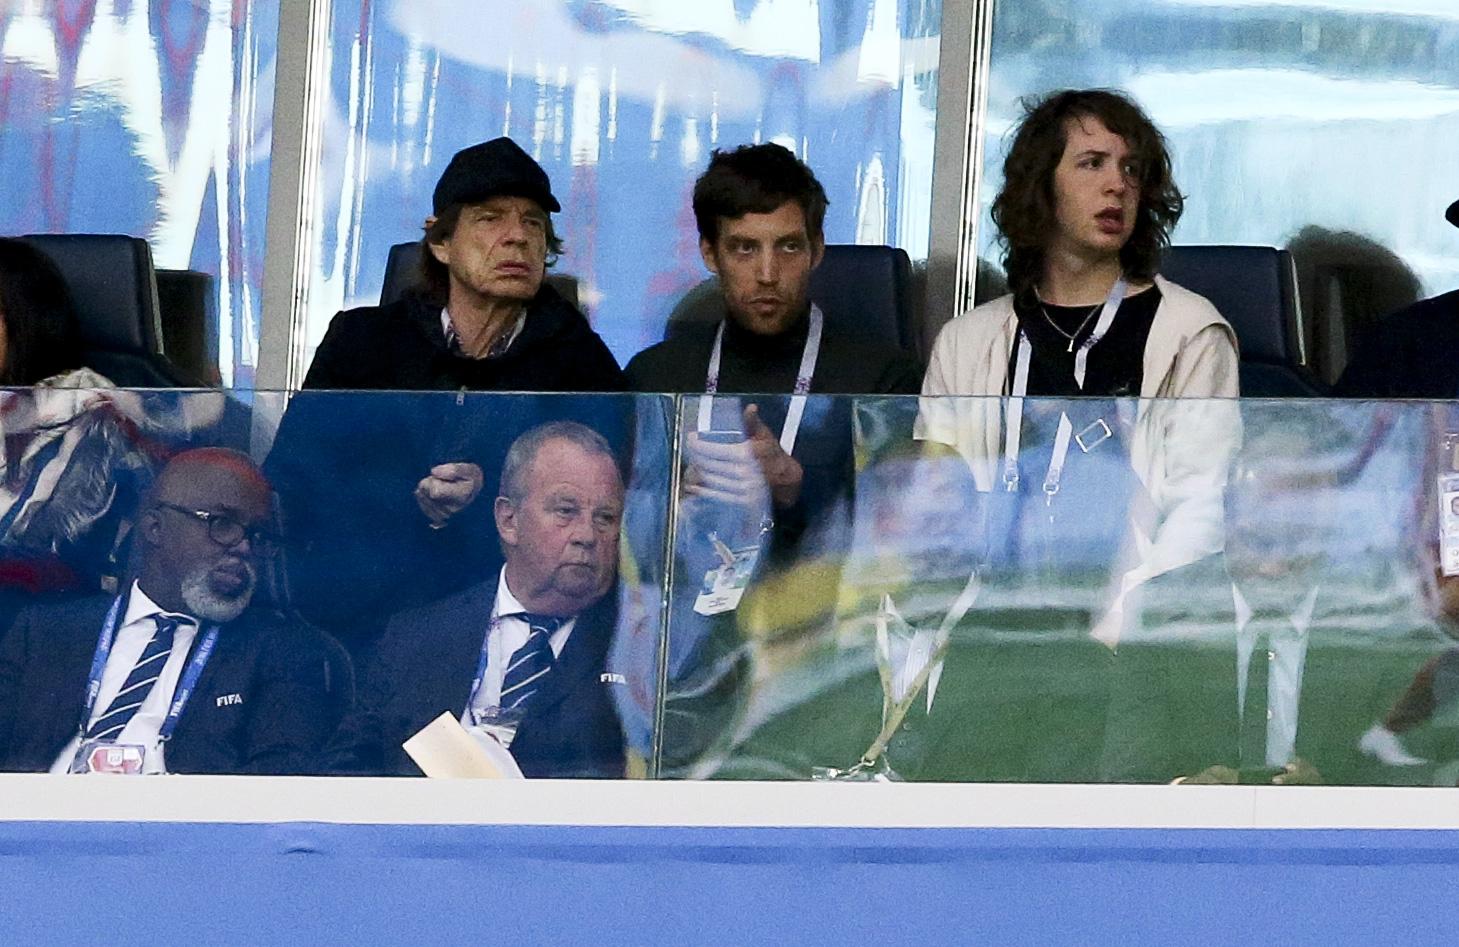 Mick Jagger, James Jagger, Lucas Morad-Jagger, soccer game, FIFA World Cup